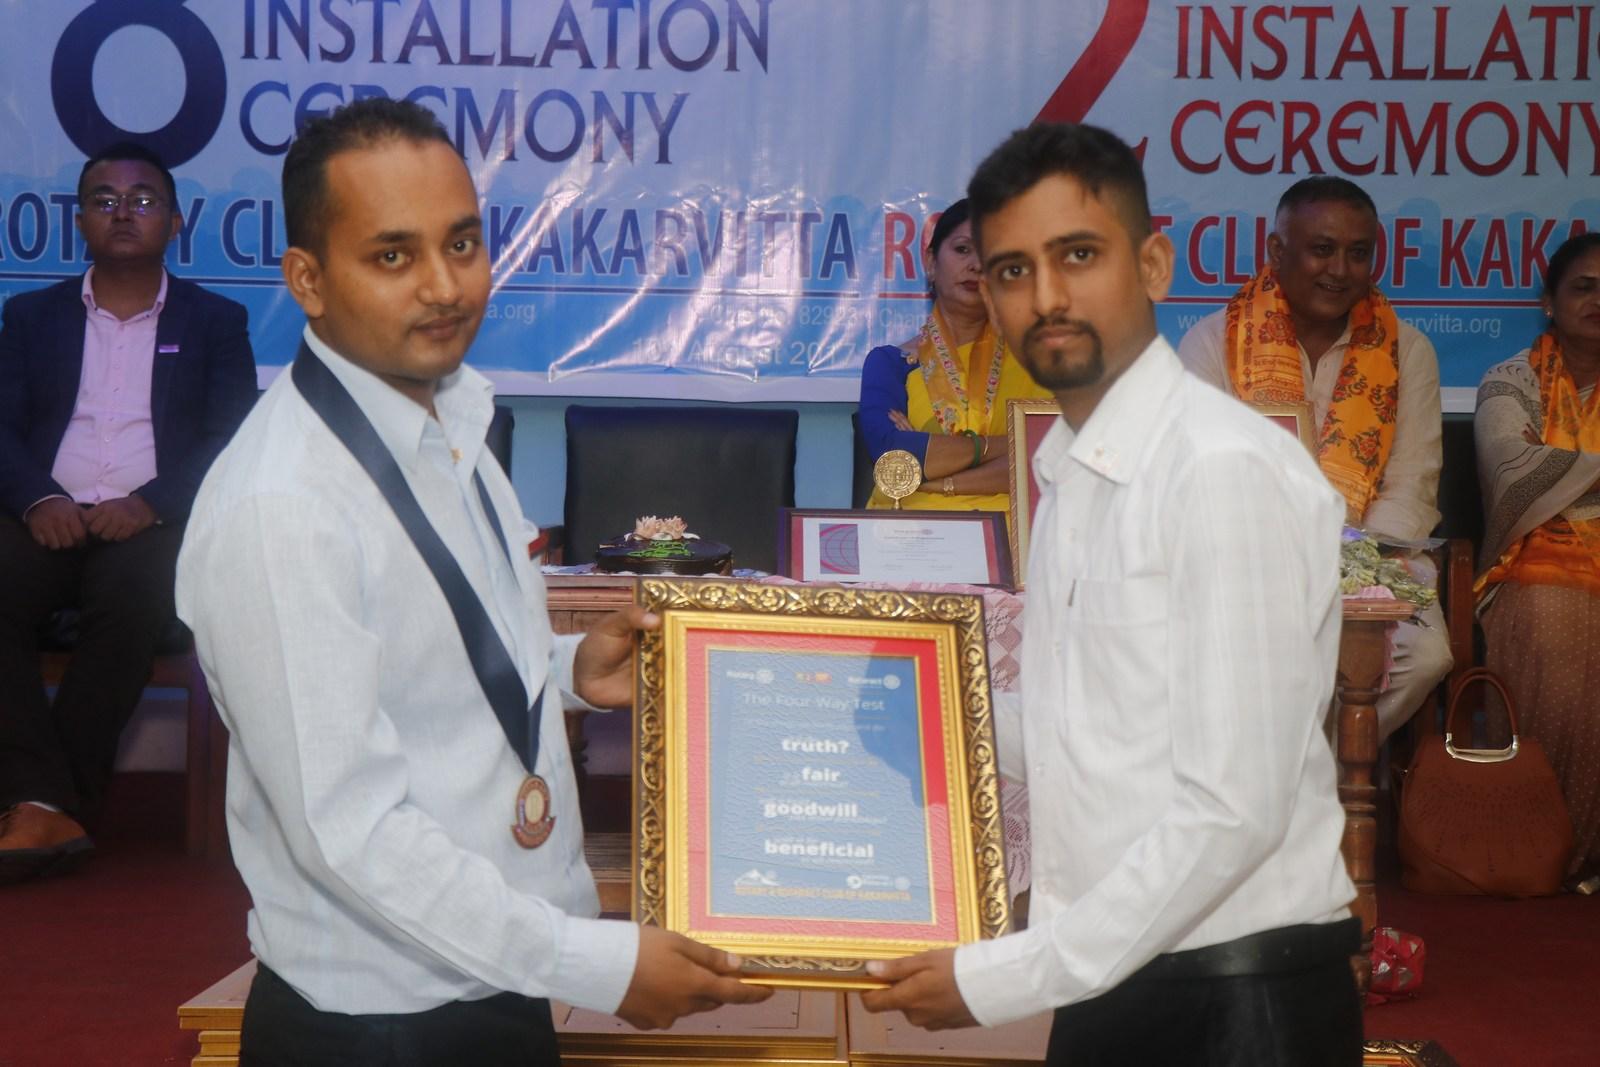 8th-Installation-Ceremony-Rotary-Club-of-Kakarvitta-102